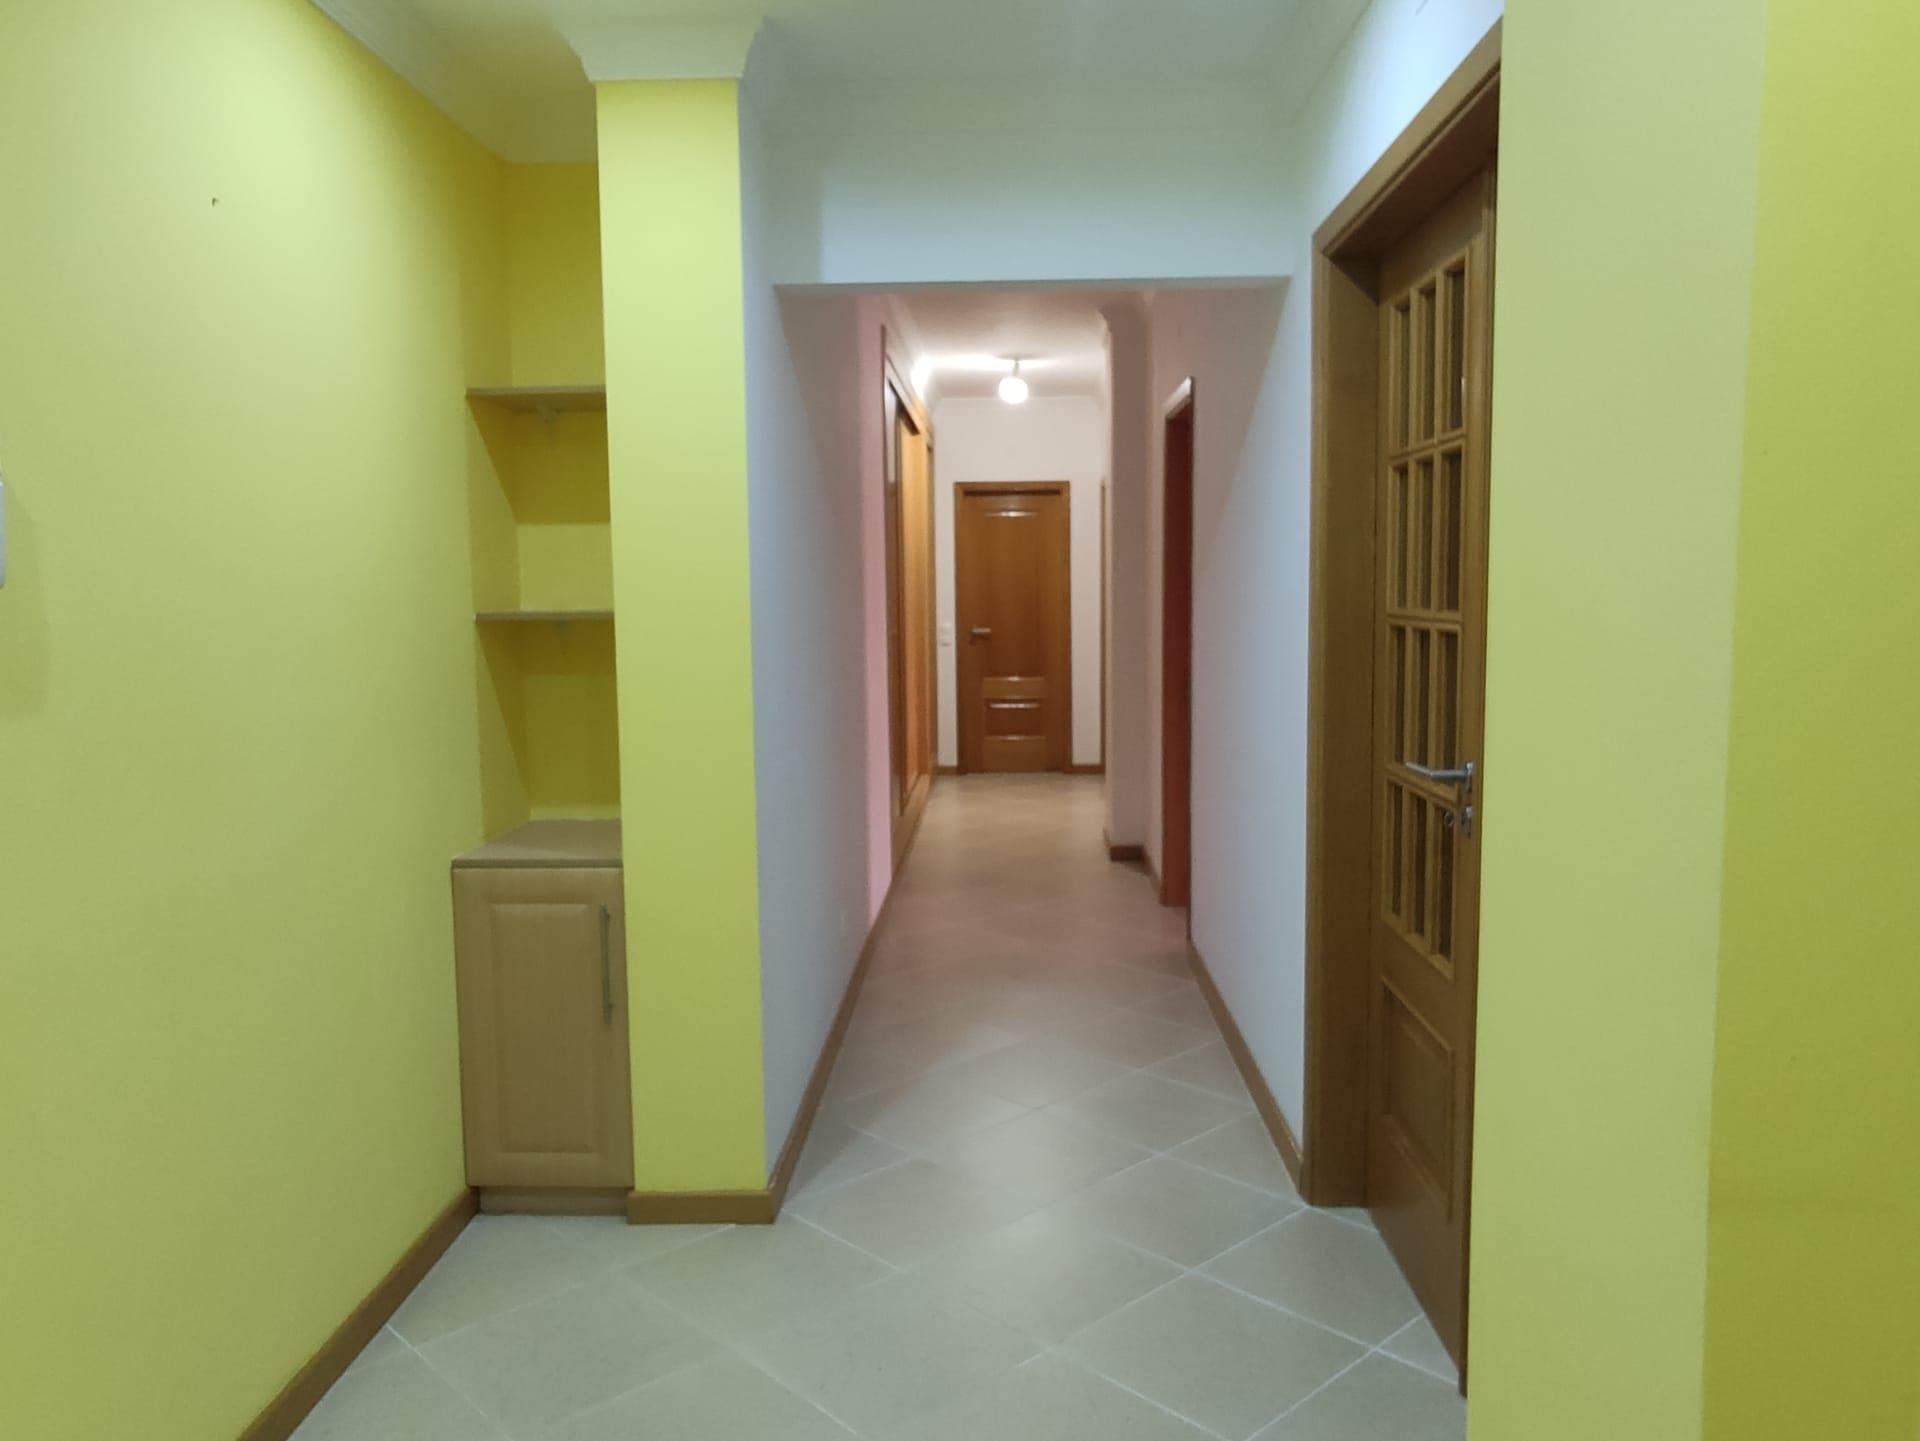 Apartamentos e moradias para alugar, Airport Apartament in Faro em Faro, Portugal Algarve, REF_IMG_13896_13905